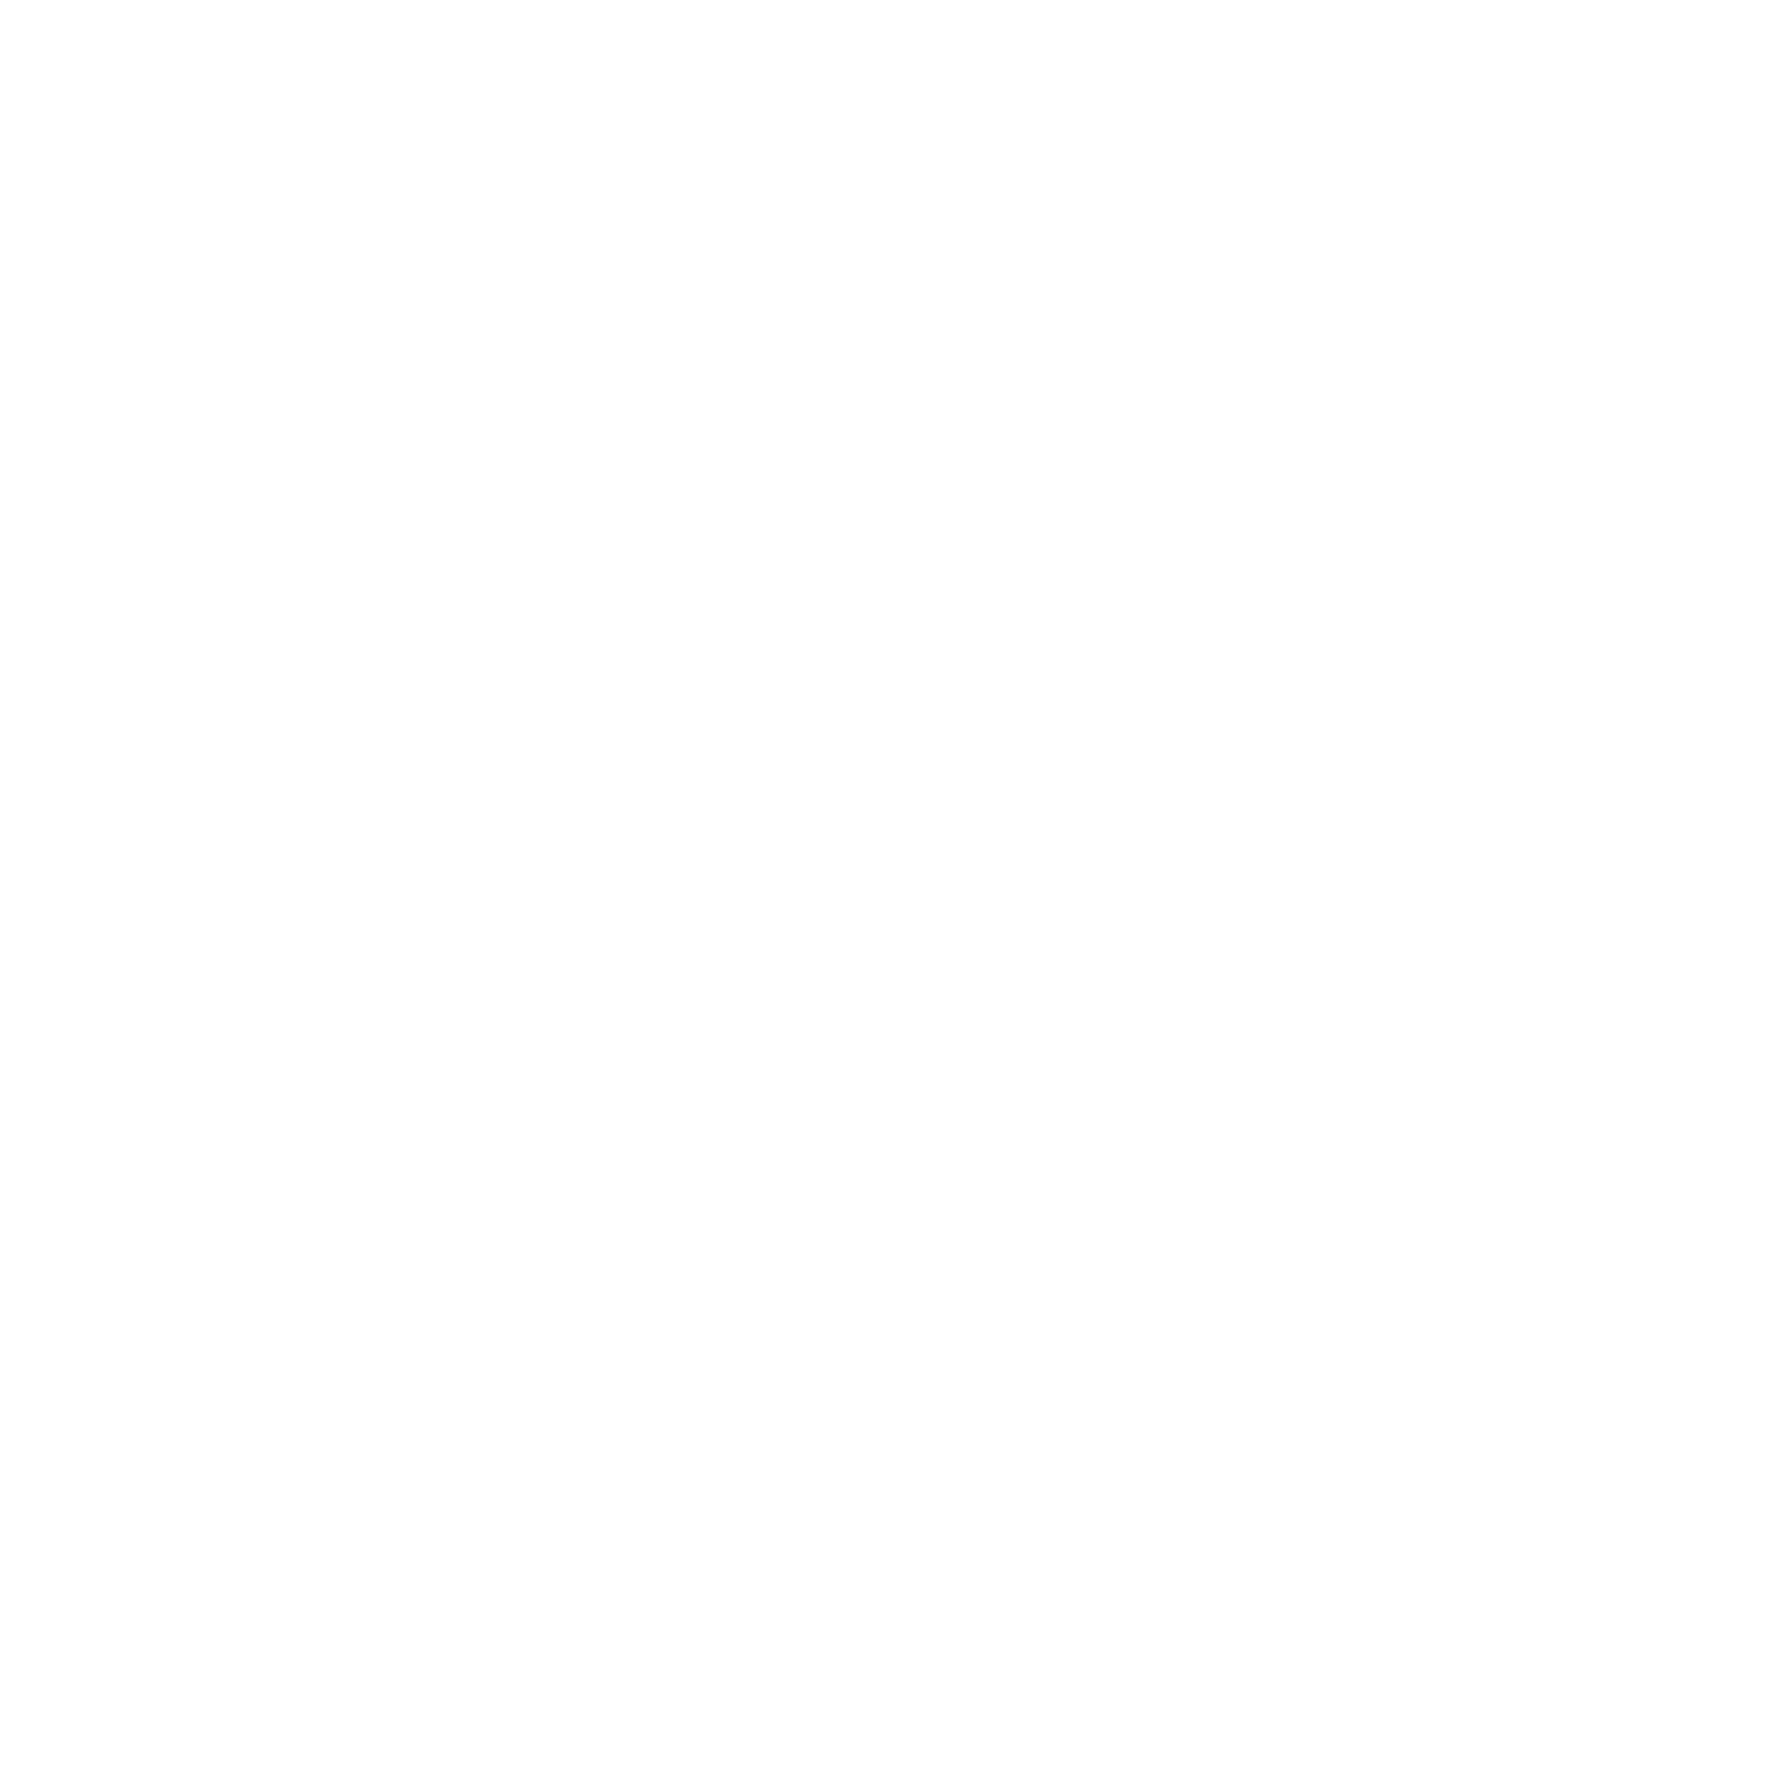 DL_mietservice-14